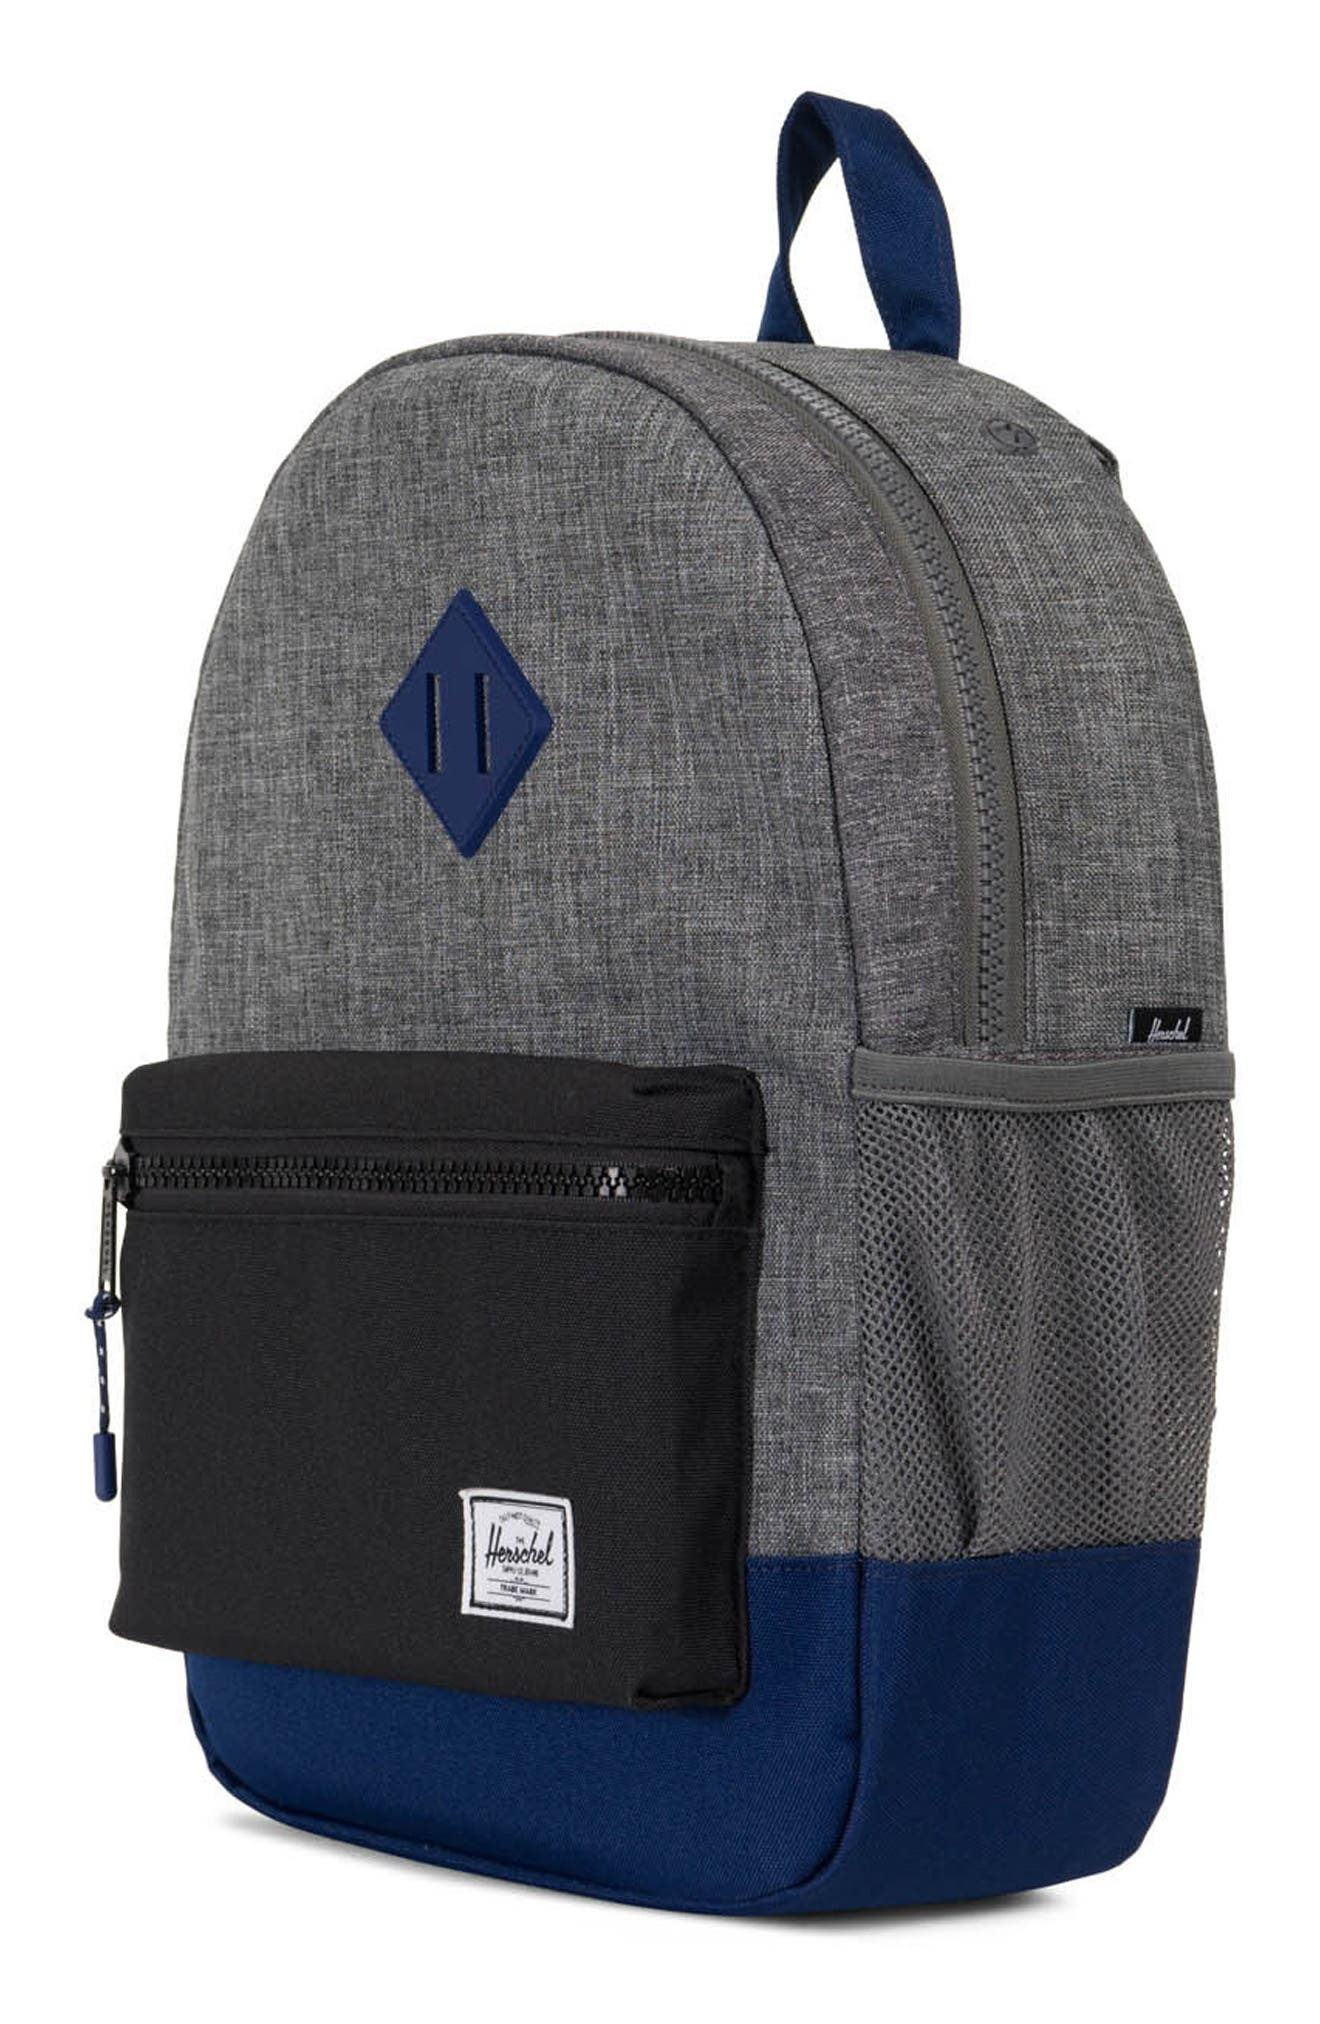 Heritage Backpack,                             Alternate thumbnail 2, color,                             Raven/ Black